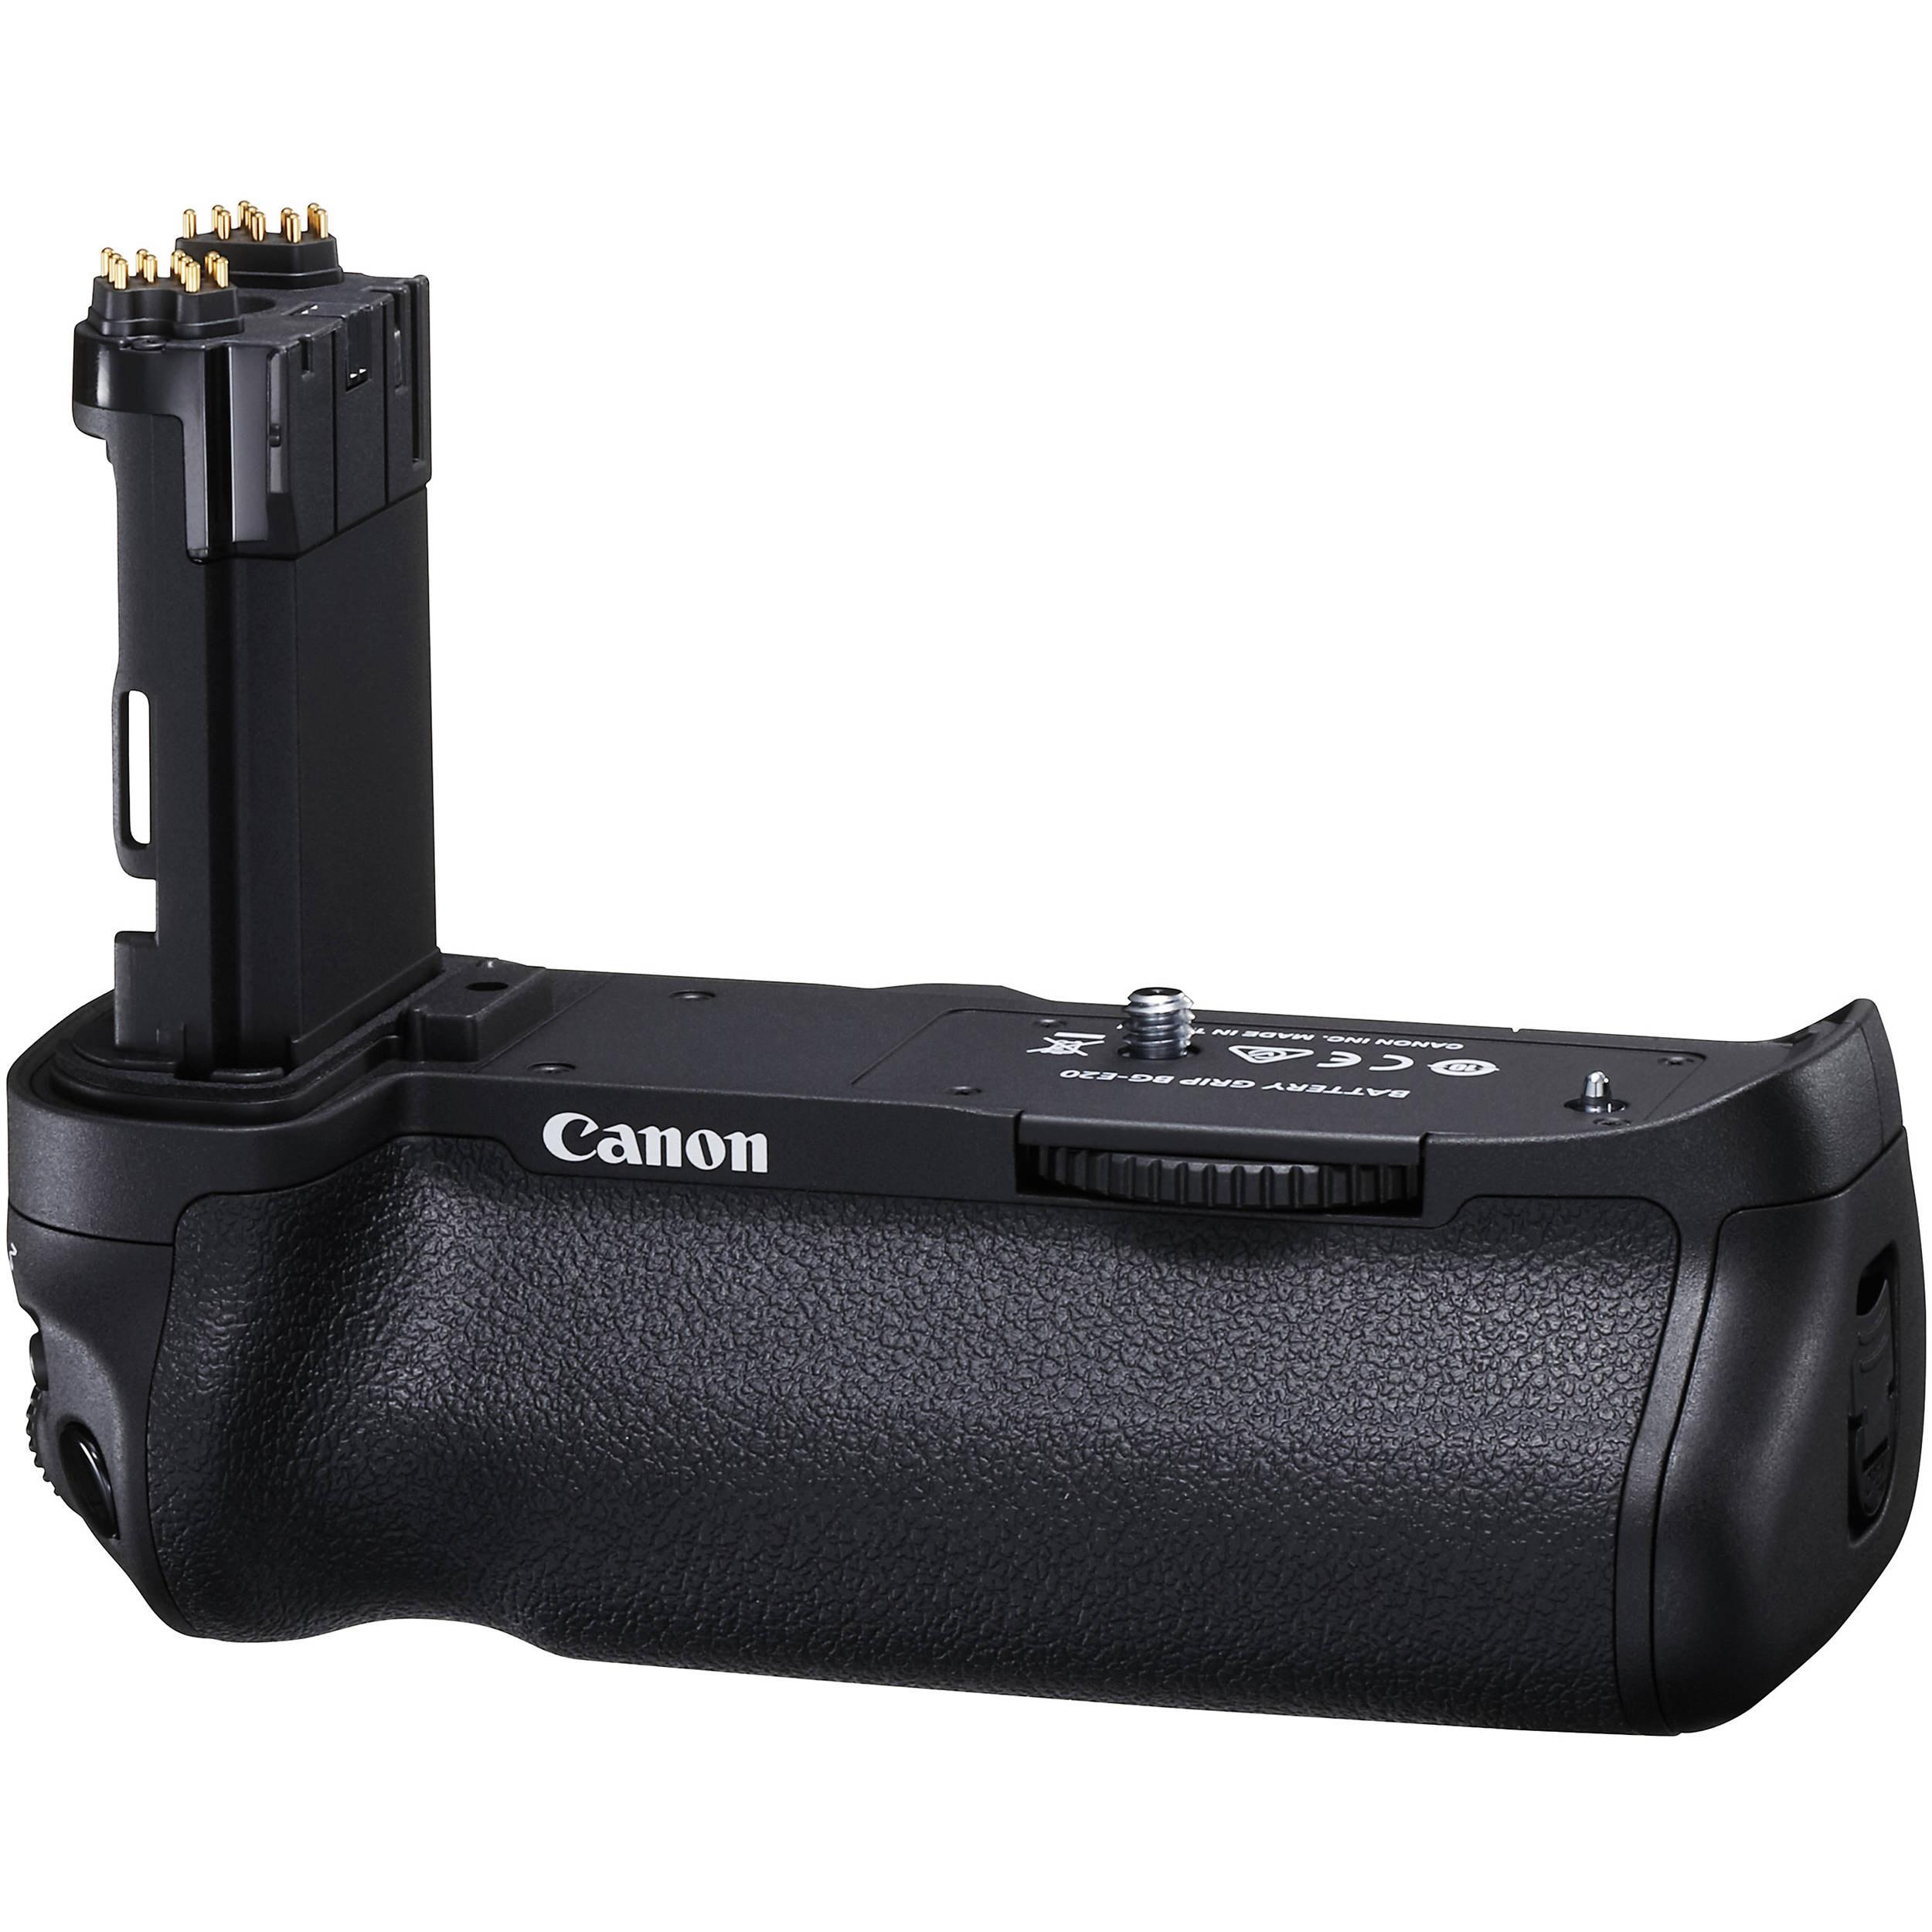 Canon BG-E20 battery grip for the 5D mk4 £129.99 @ Amazon